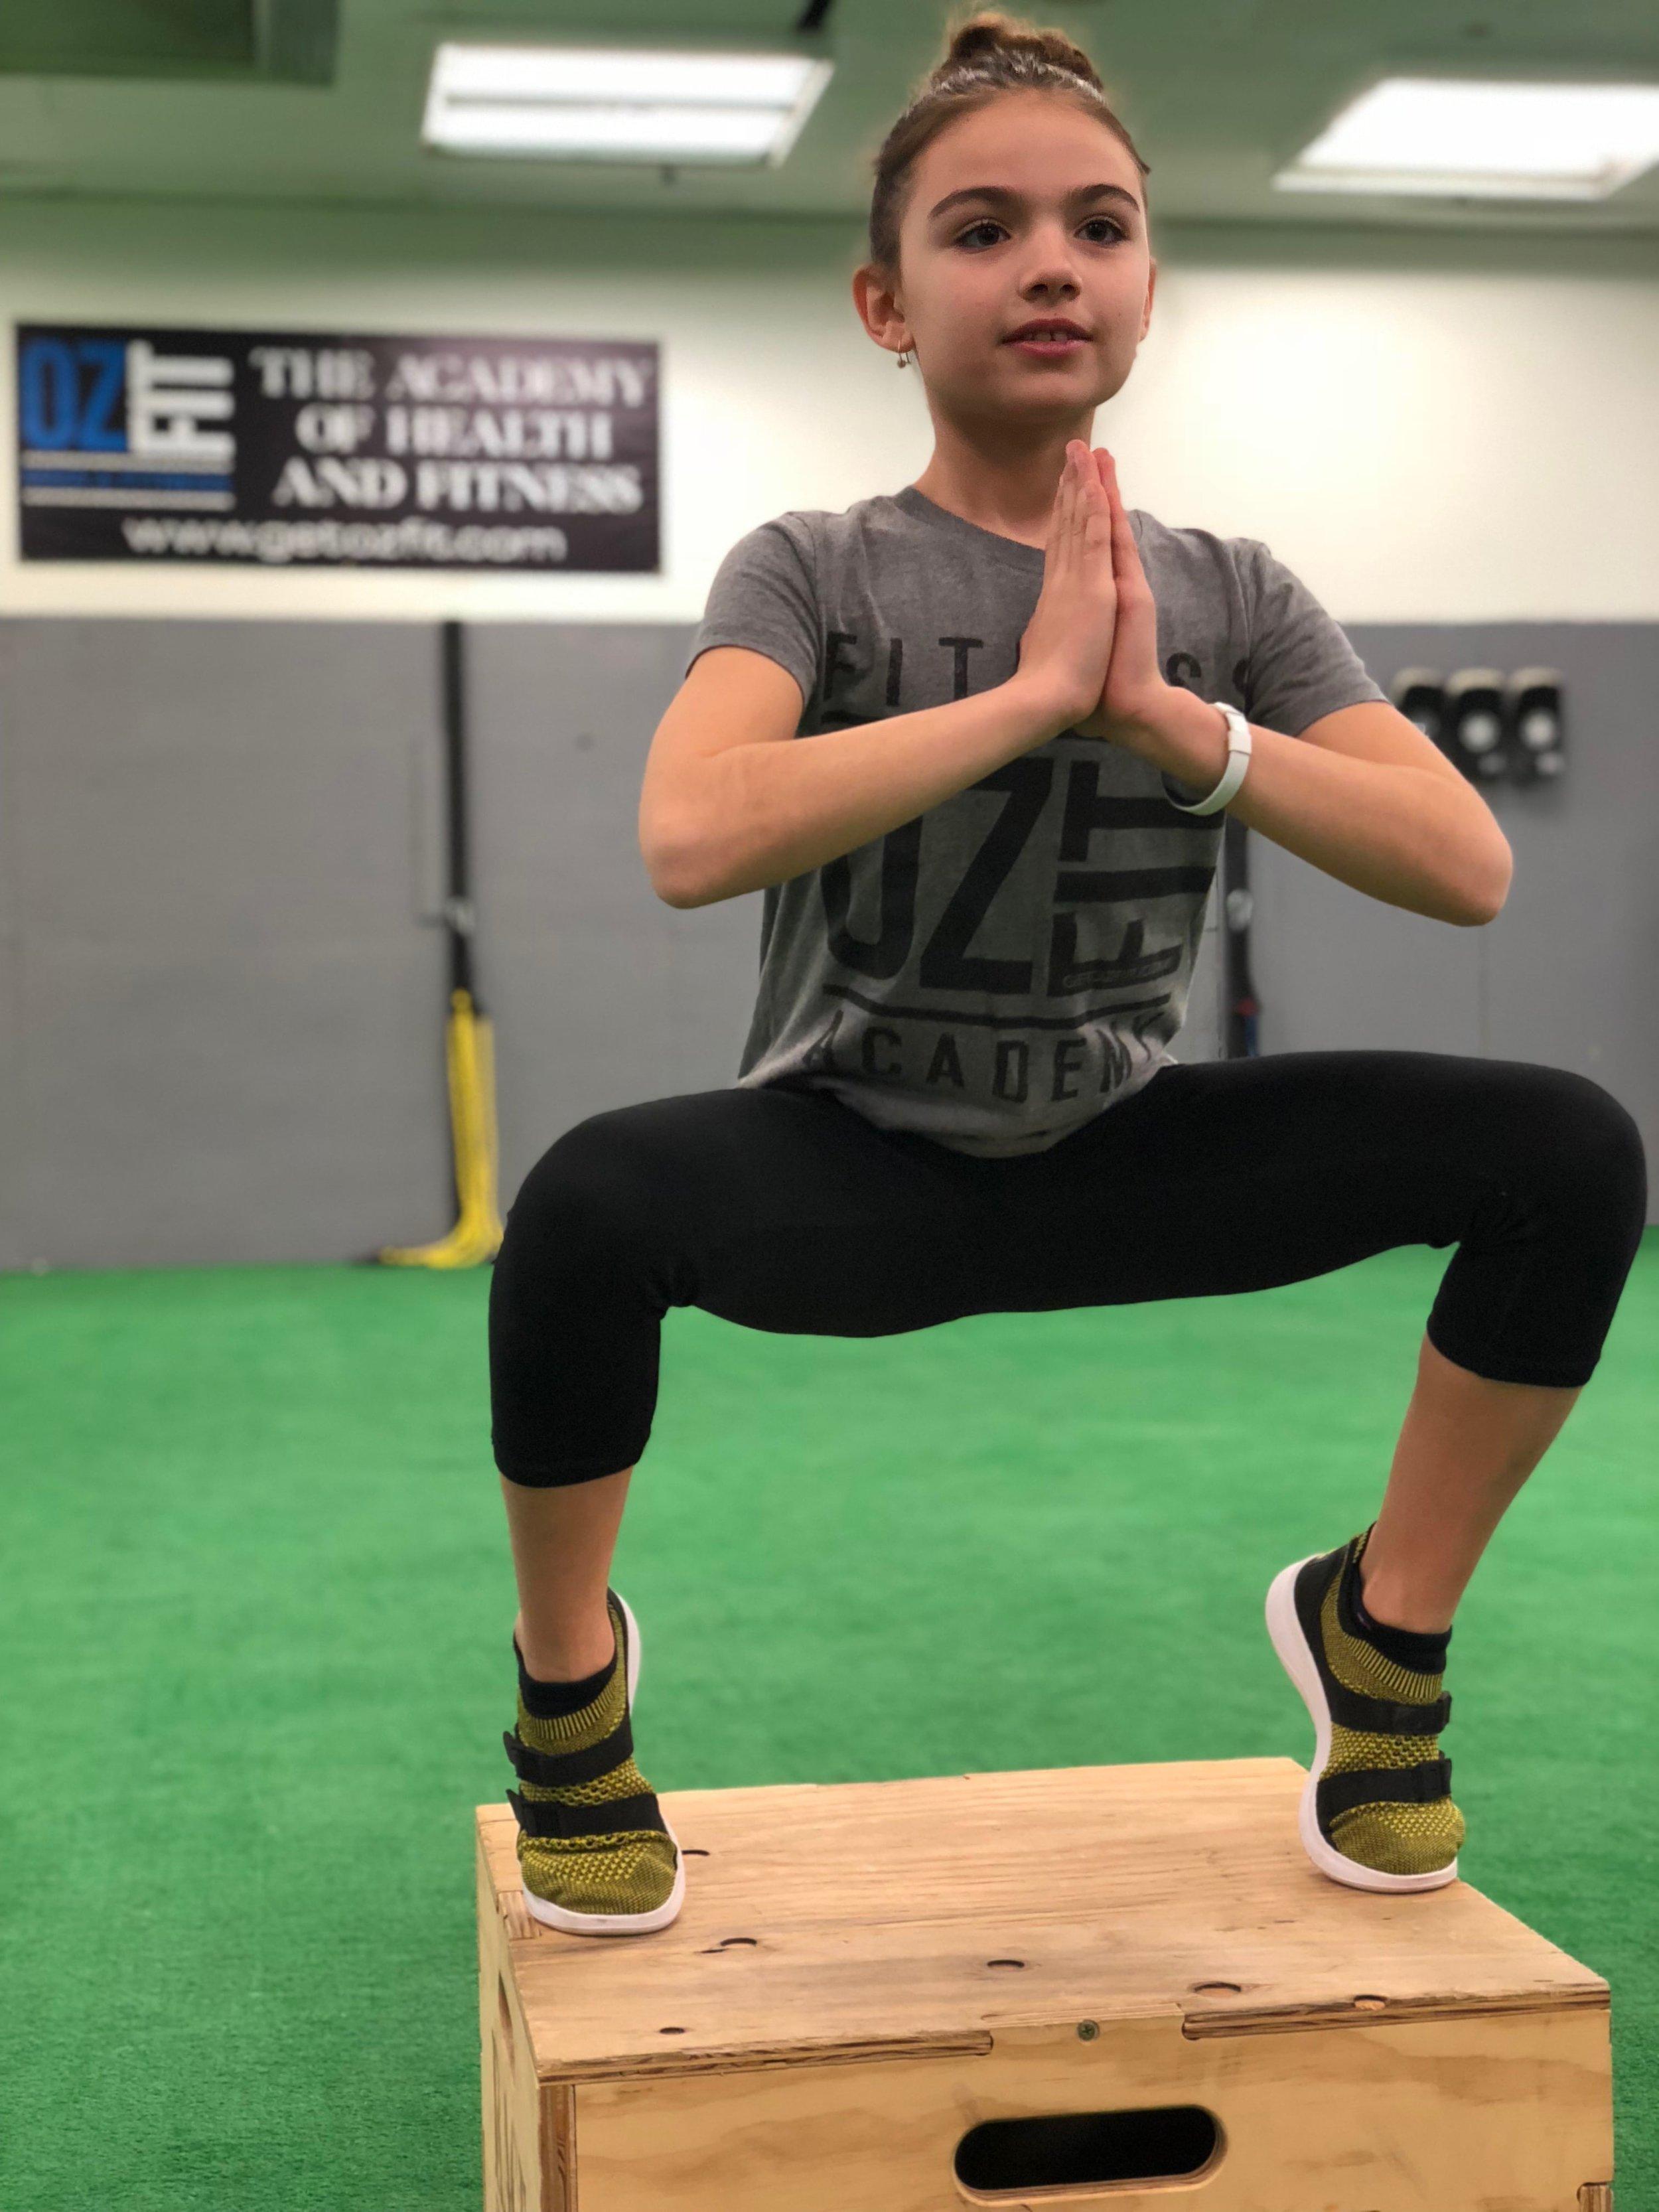 Get Oz Fit - Personal Trainer in Bergen County New Jersey - Ozzy Dugulubgov - Kids Training - Youth Fitness Program NJ (4)-min.jpeg